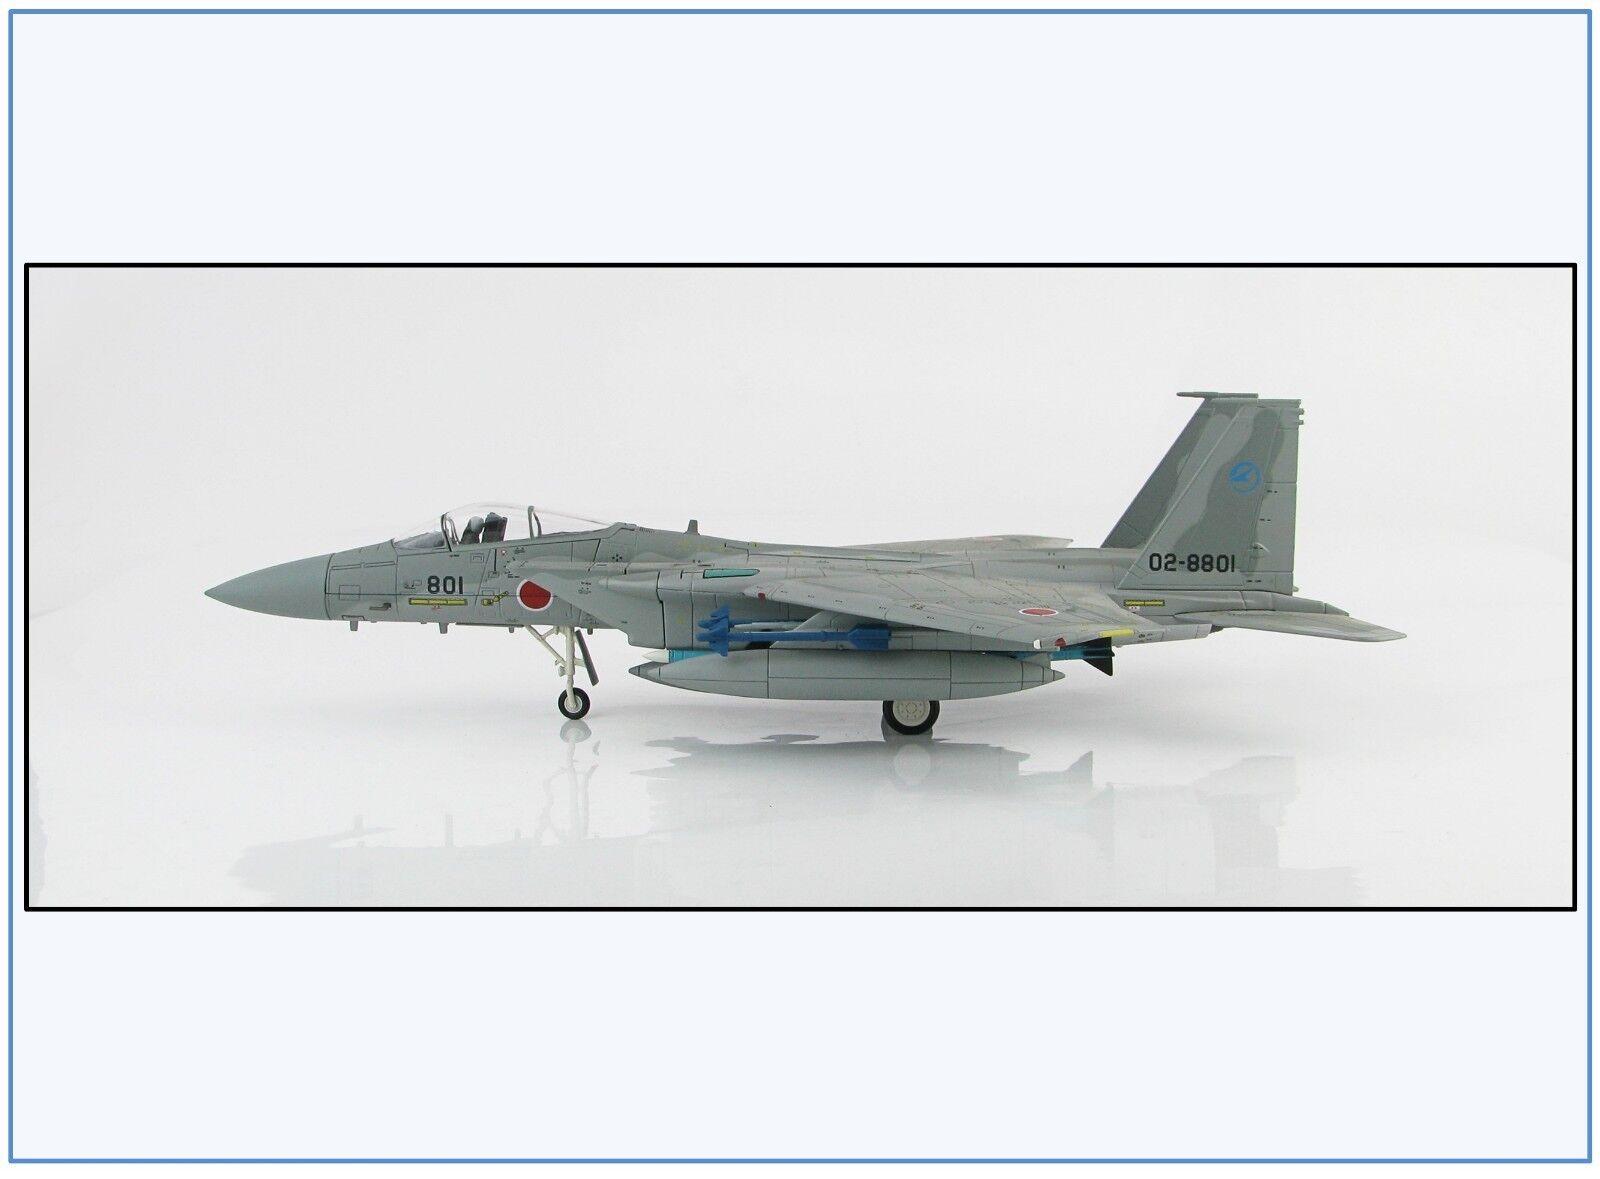 Ha4515 f-15j Eagle JASDF adtw, Gifu AB, le japon, HOBBY MASTER 1 72 Neuf 1 19 &